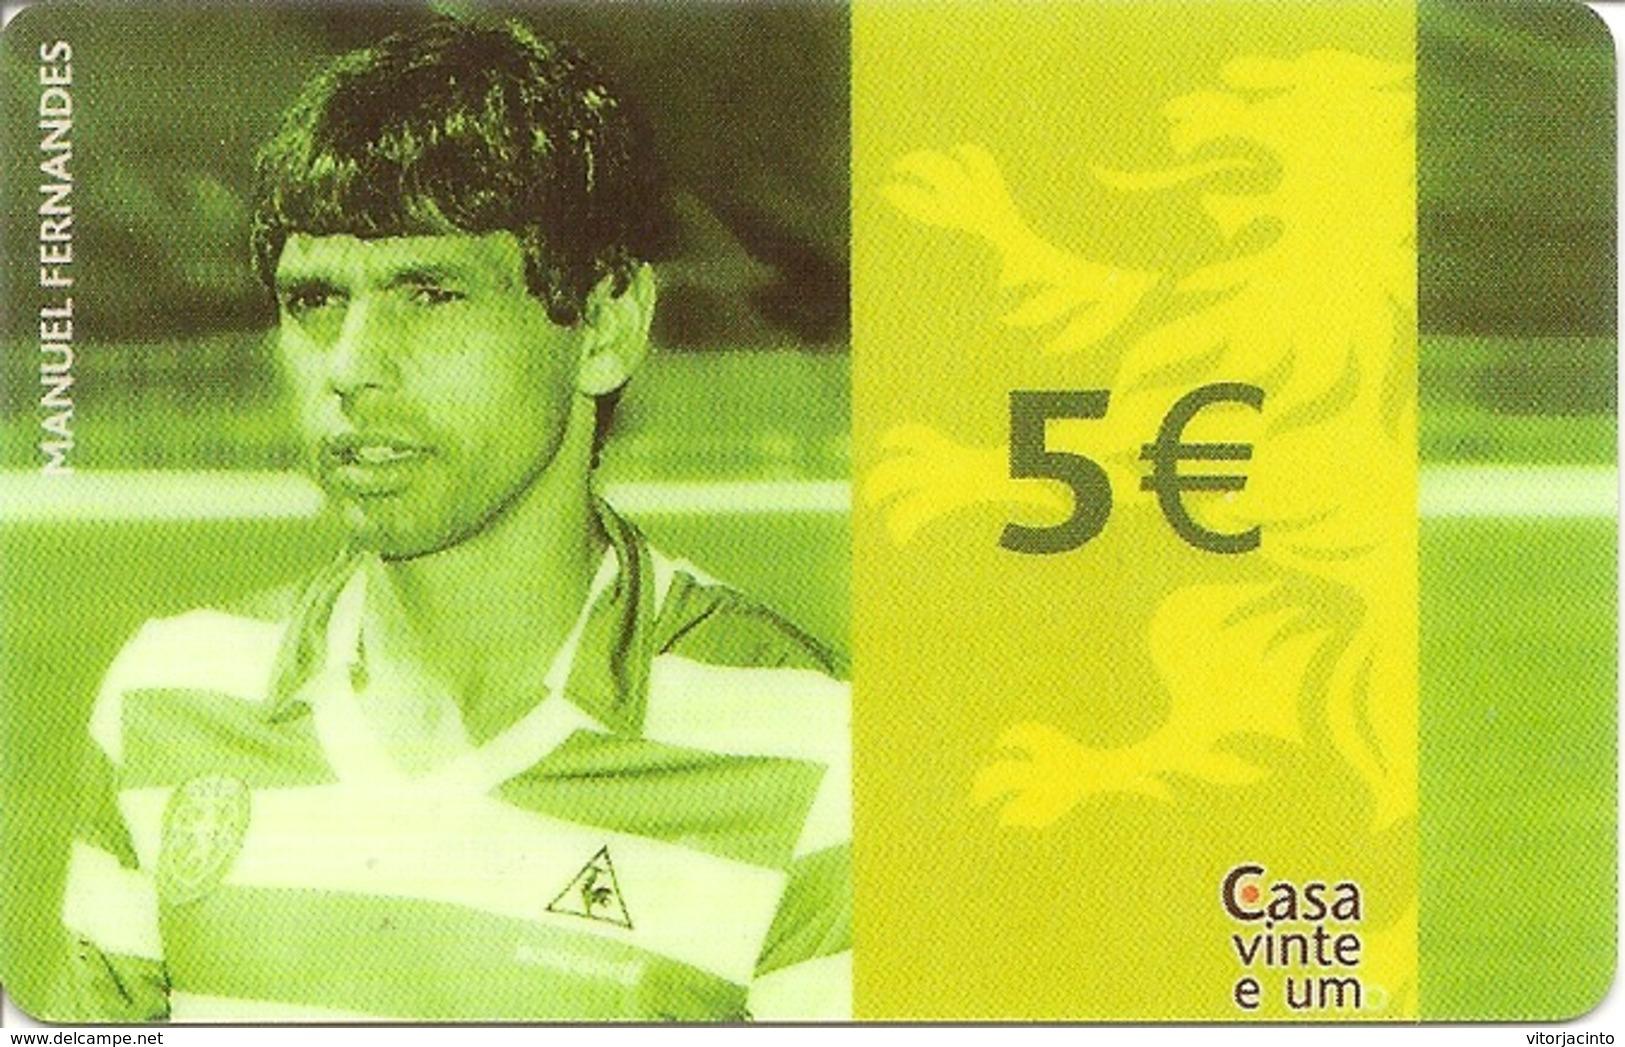 Casa Vinte E Um - Sport -  Football Player (Manuel Fernandes) - Unclassified